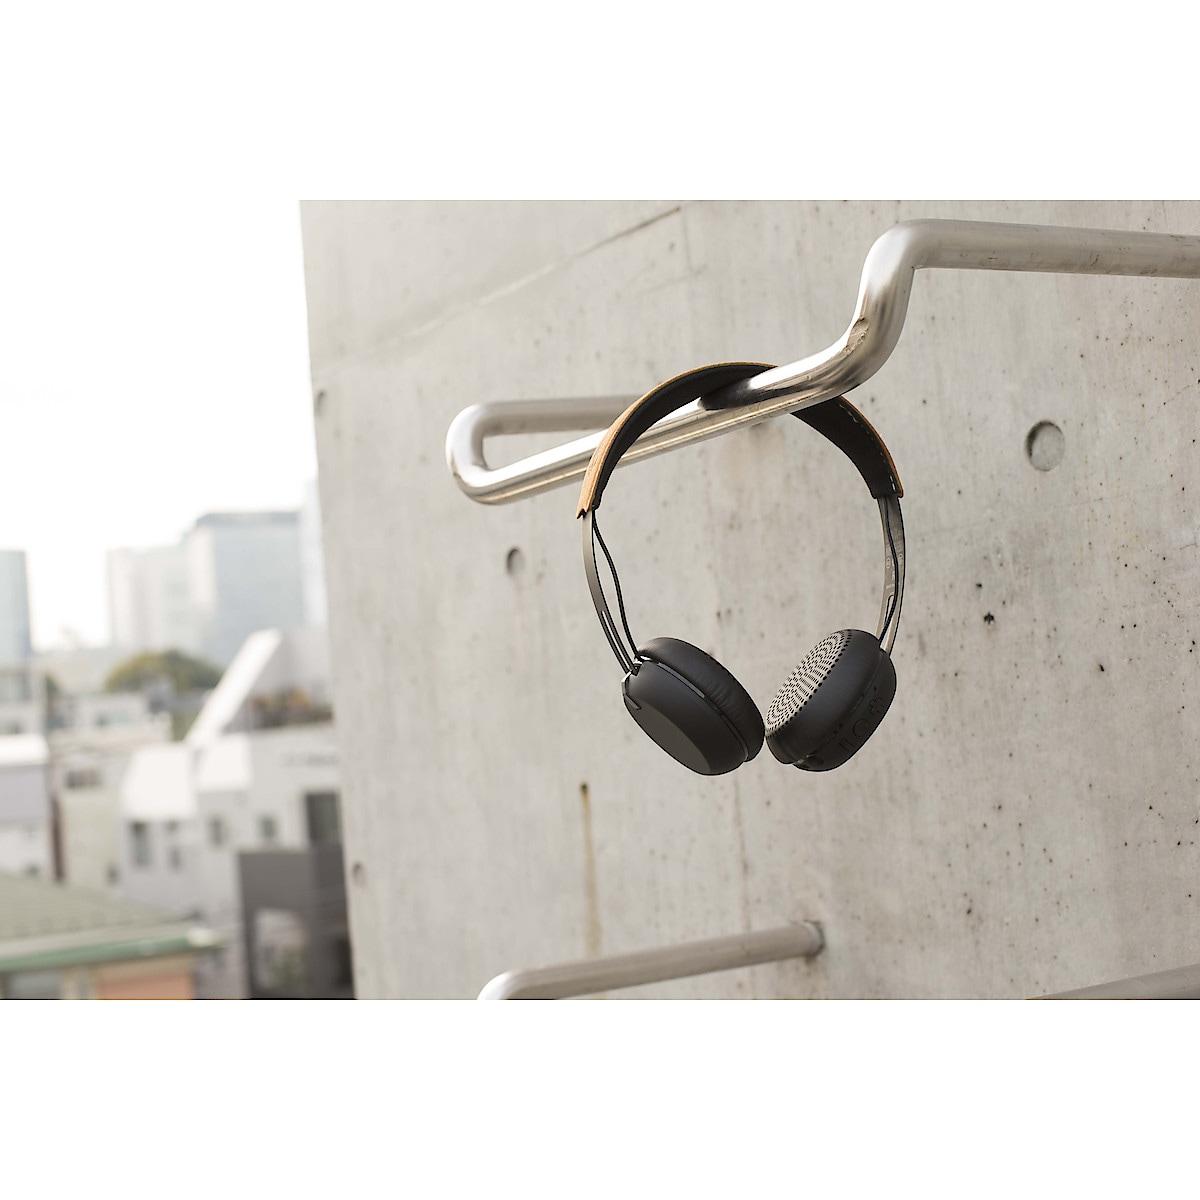 Skullcandy Grind Wireless, trådløse hodetelefoner med mikrofon